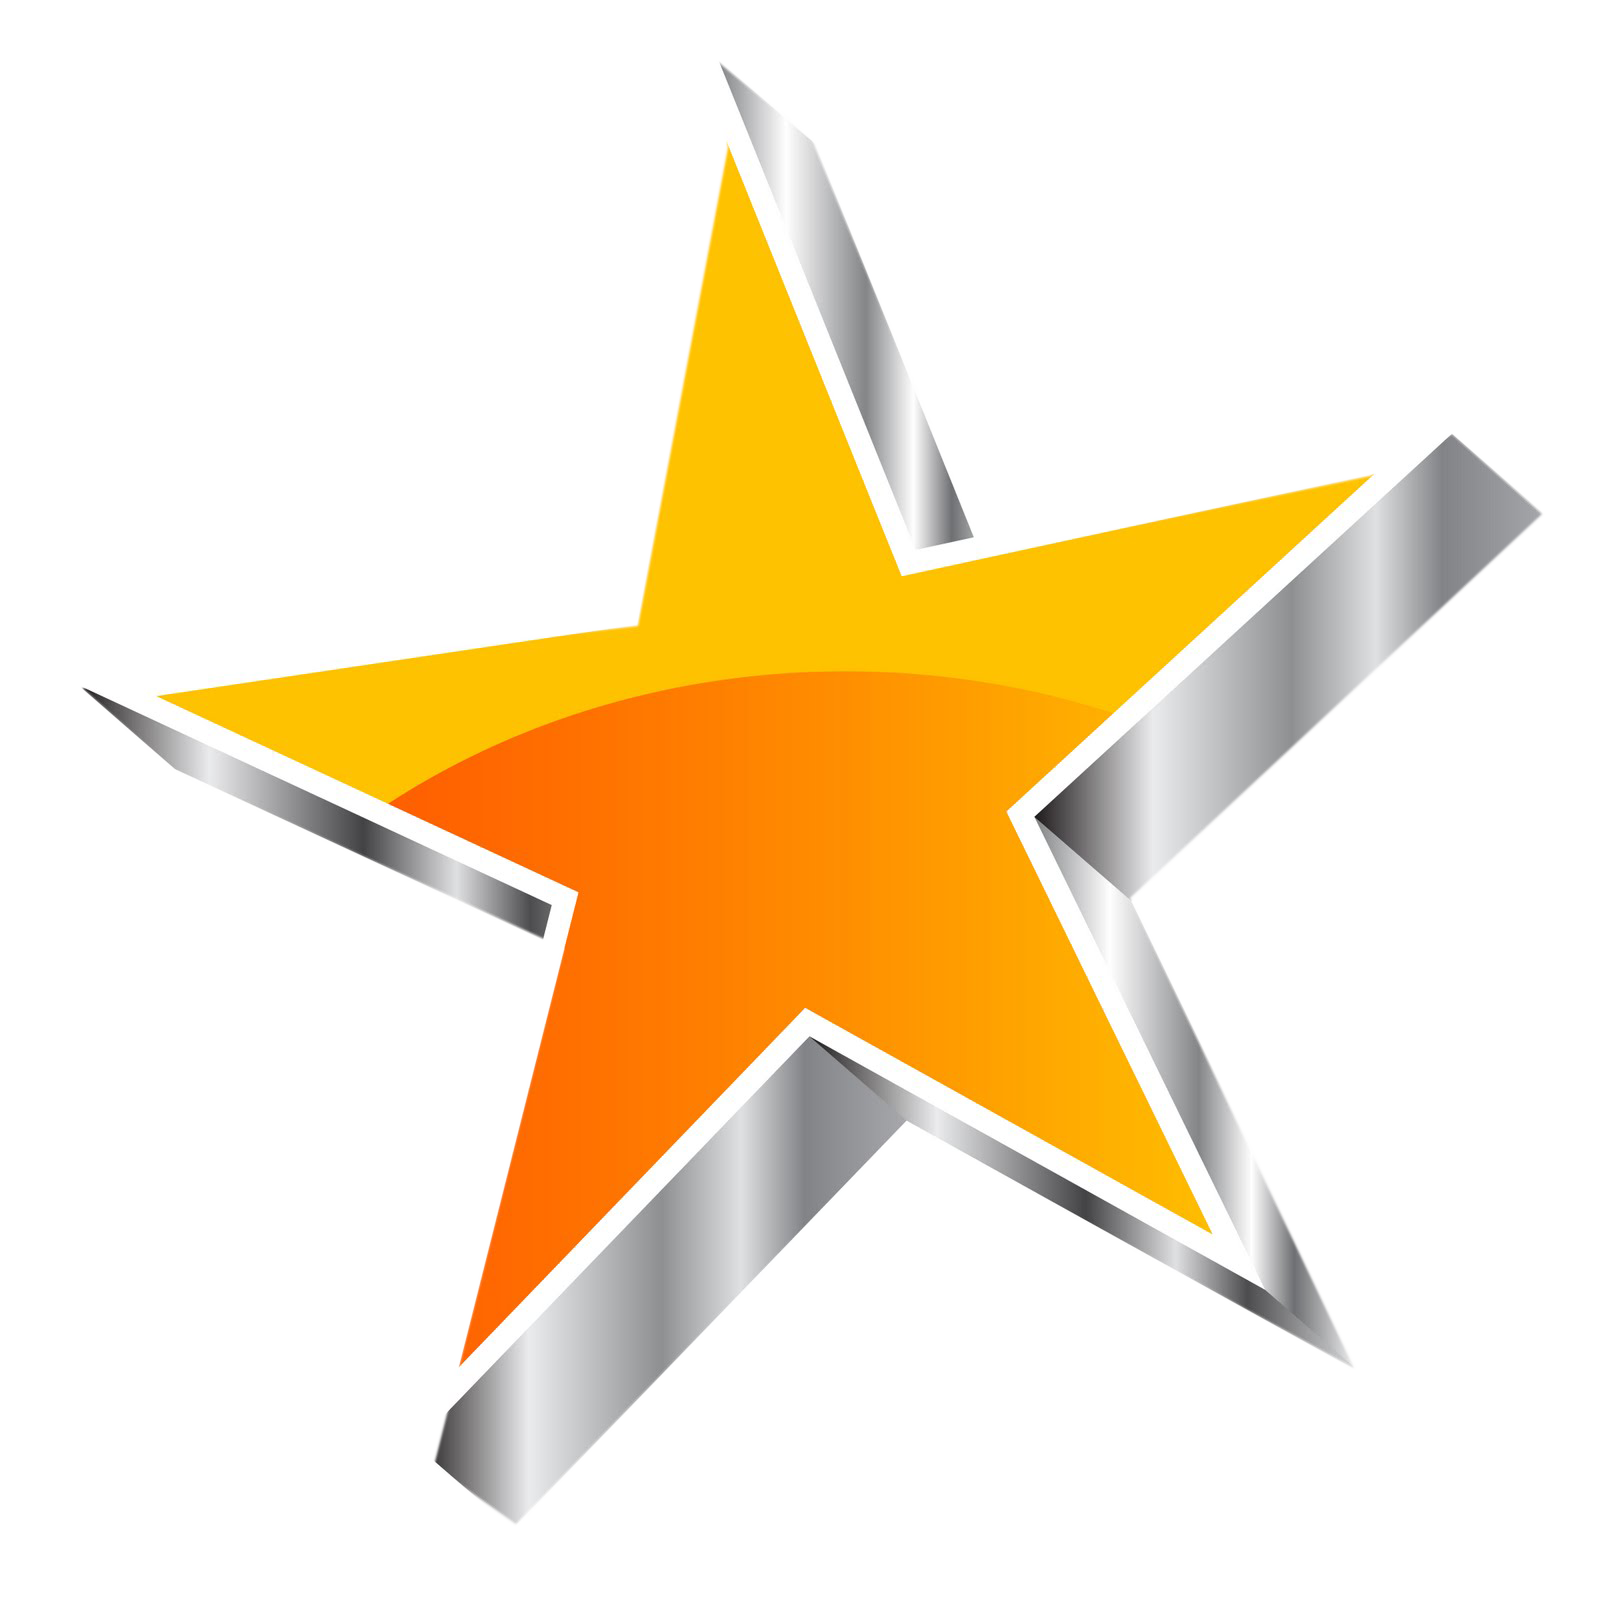 Orange star clipart graphic transparent Star png, Star png images download free graphic transparent